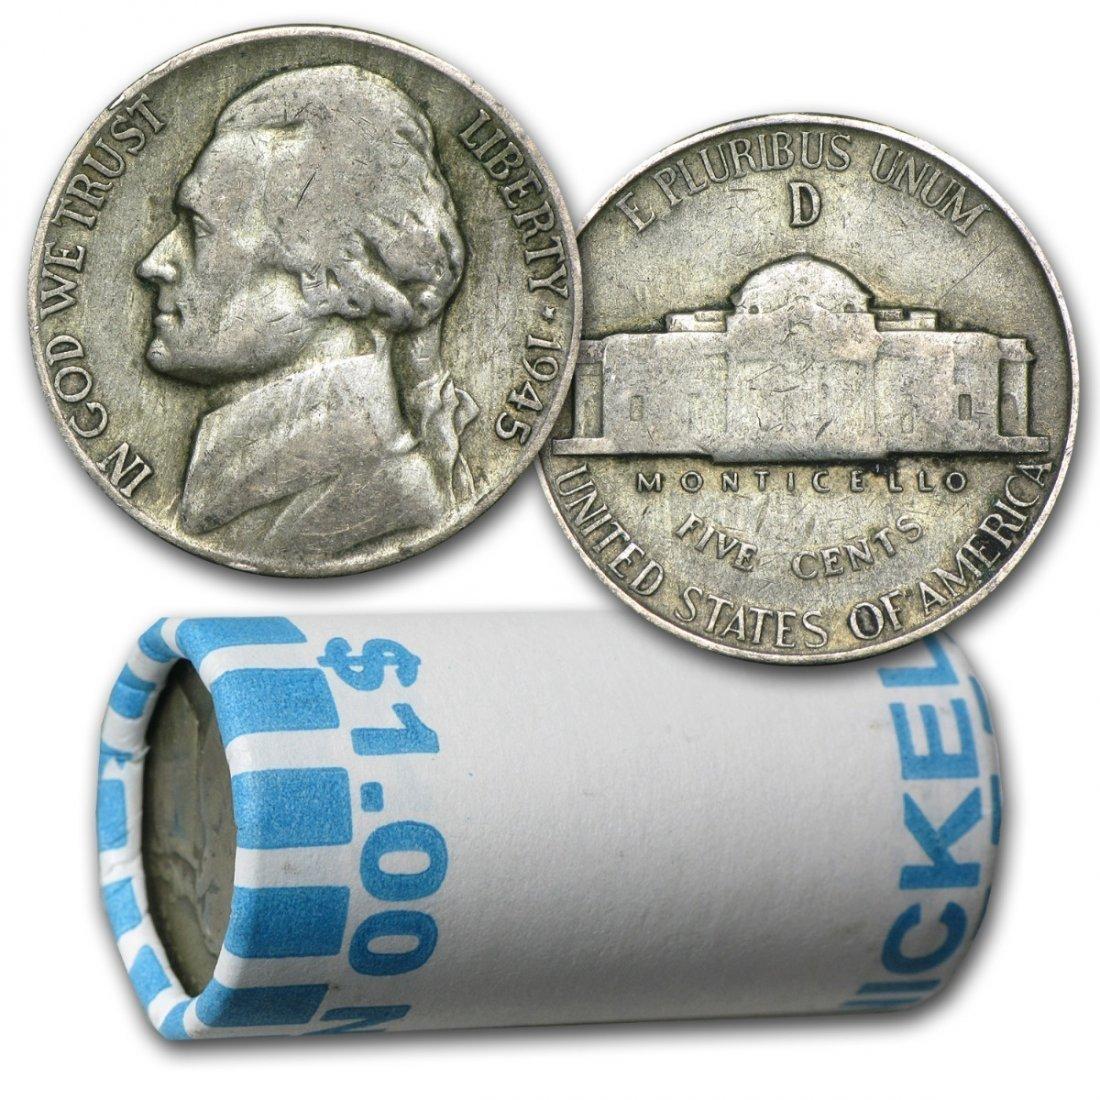 35% Silver War Nickels - $1 Face Value - 35 Percent